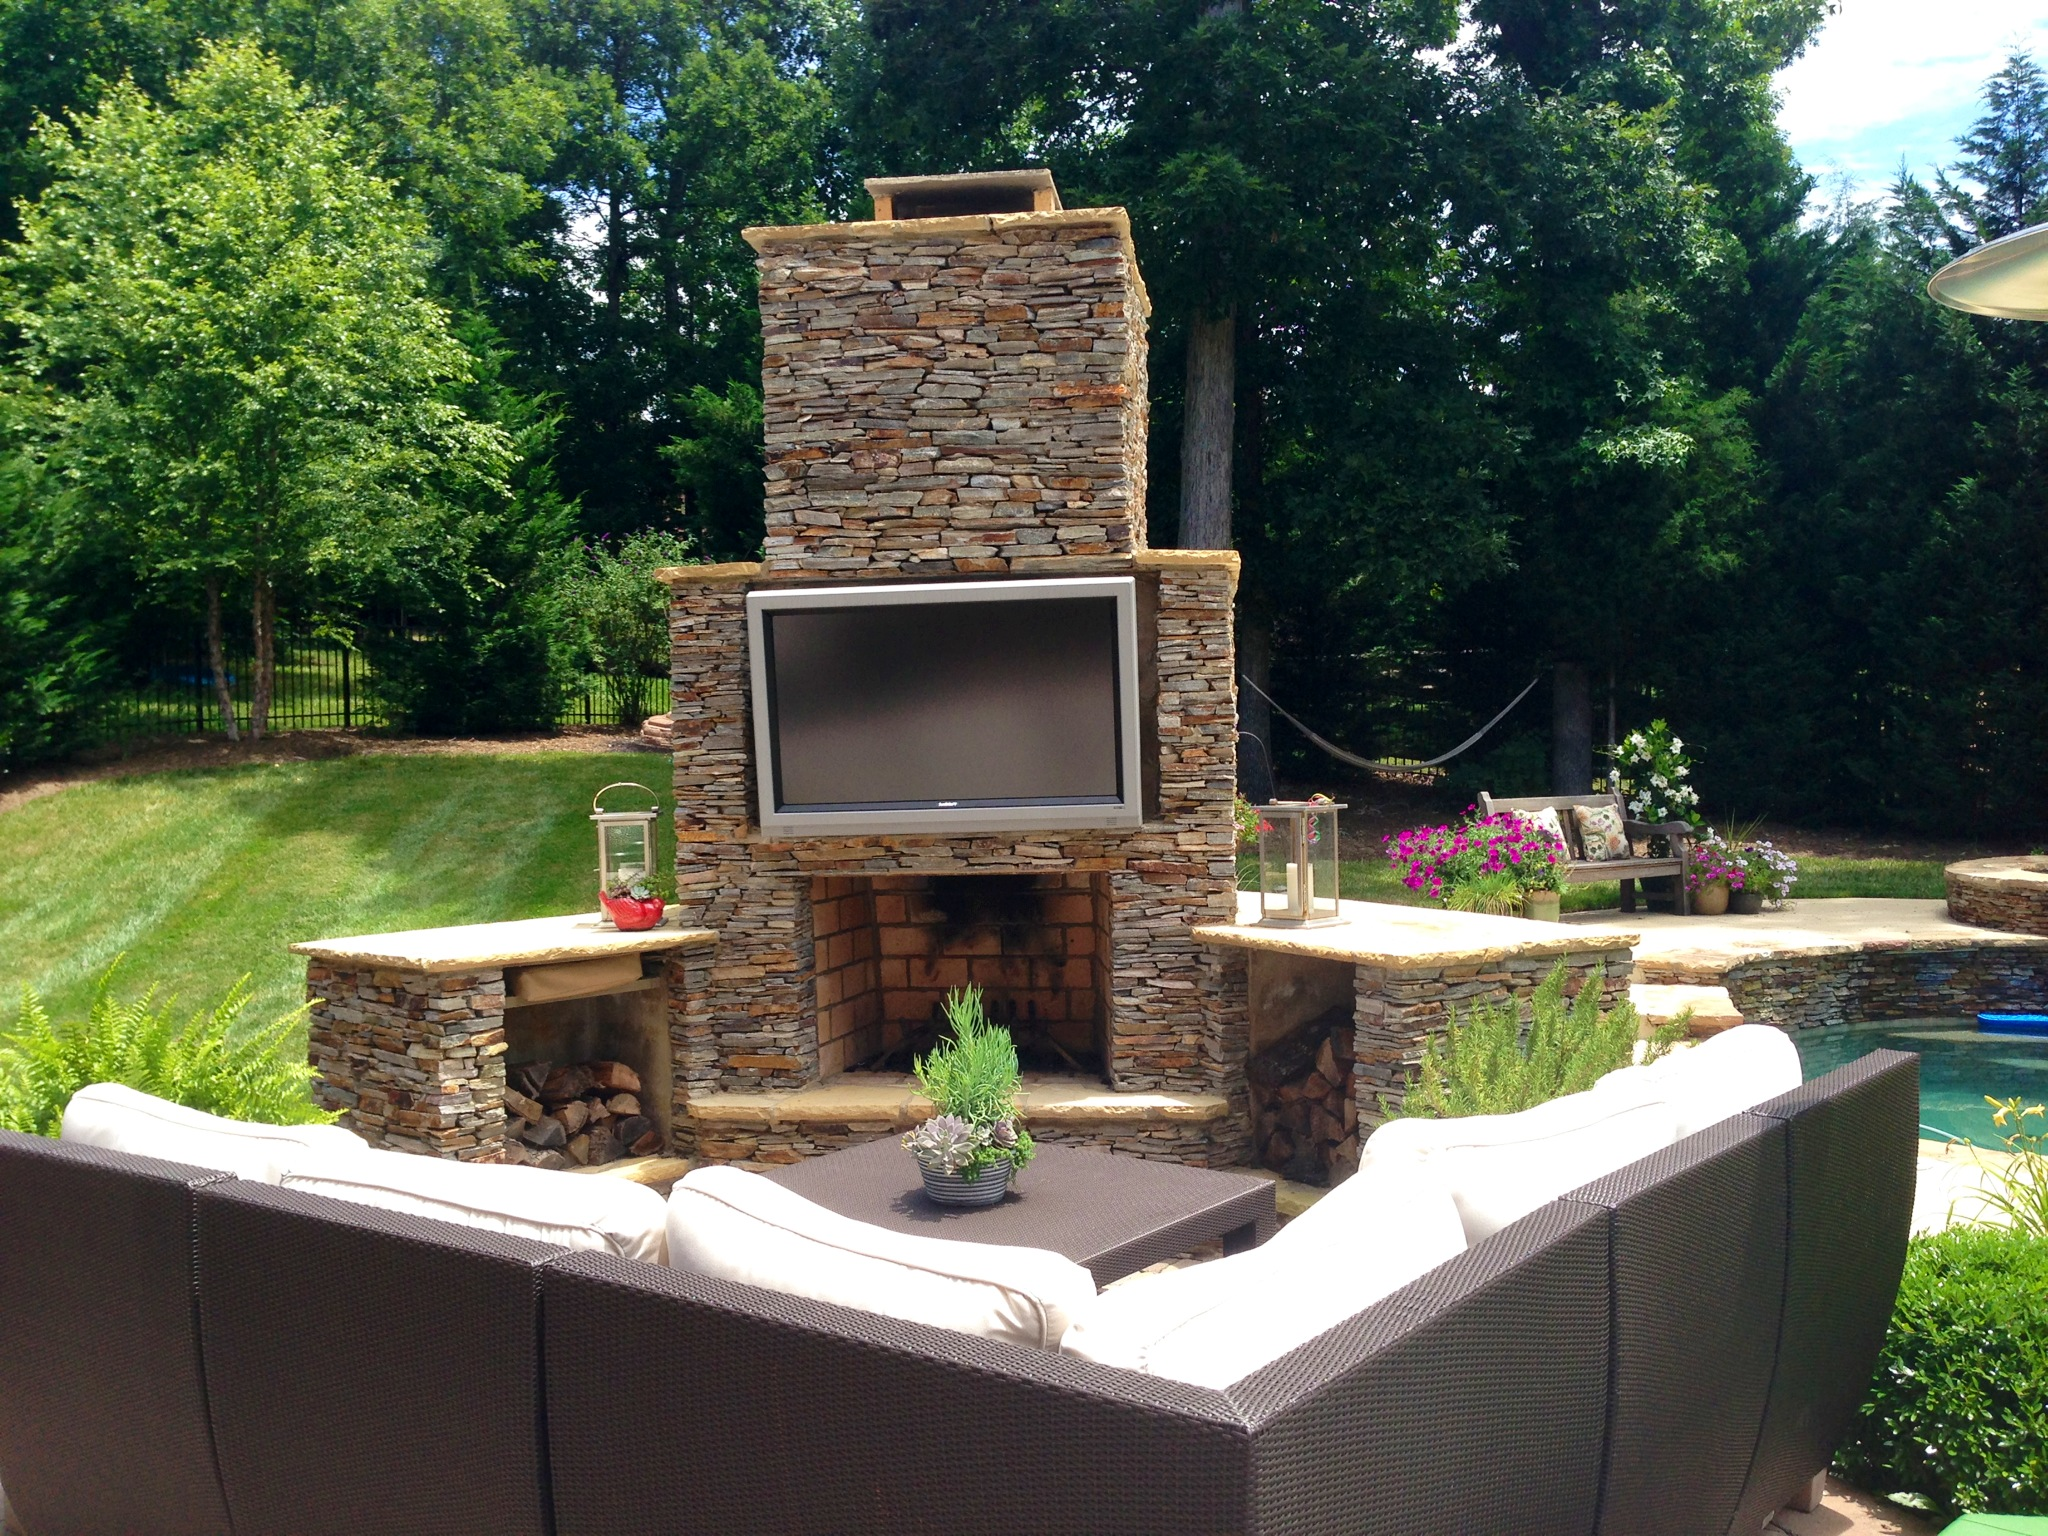 How To Build A Backyard Man Cave | St. Louis decks ... on Open Backyard Ideas id=25717